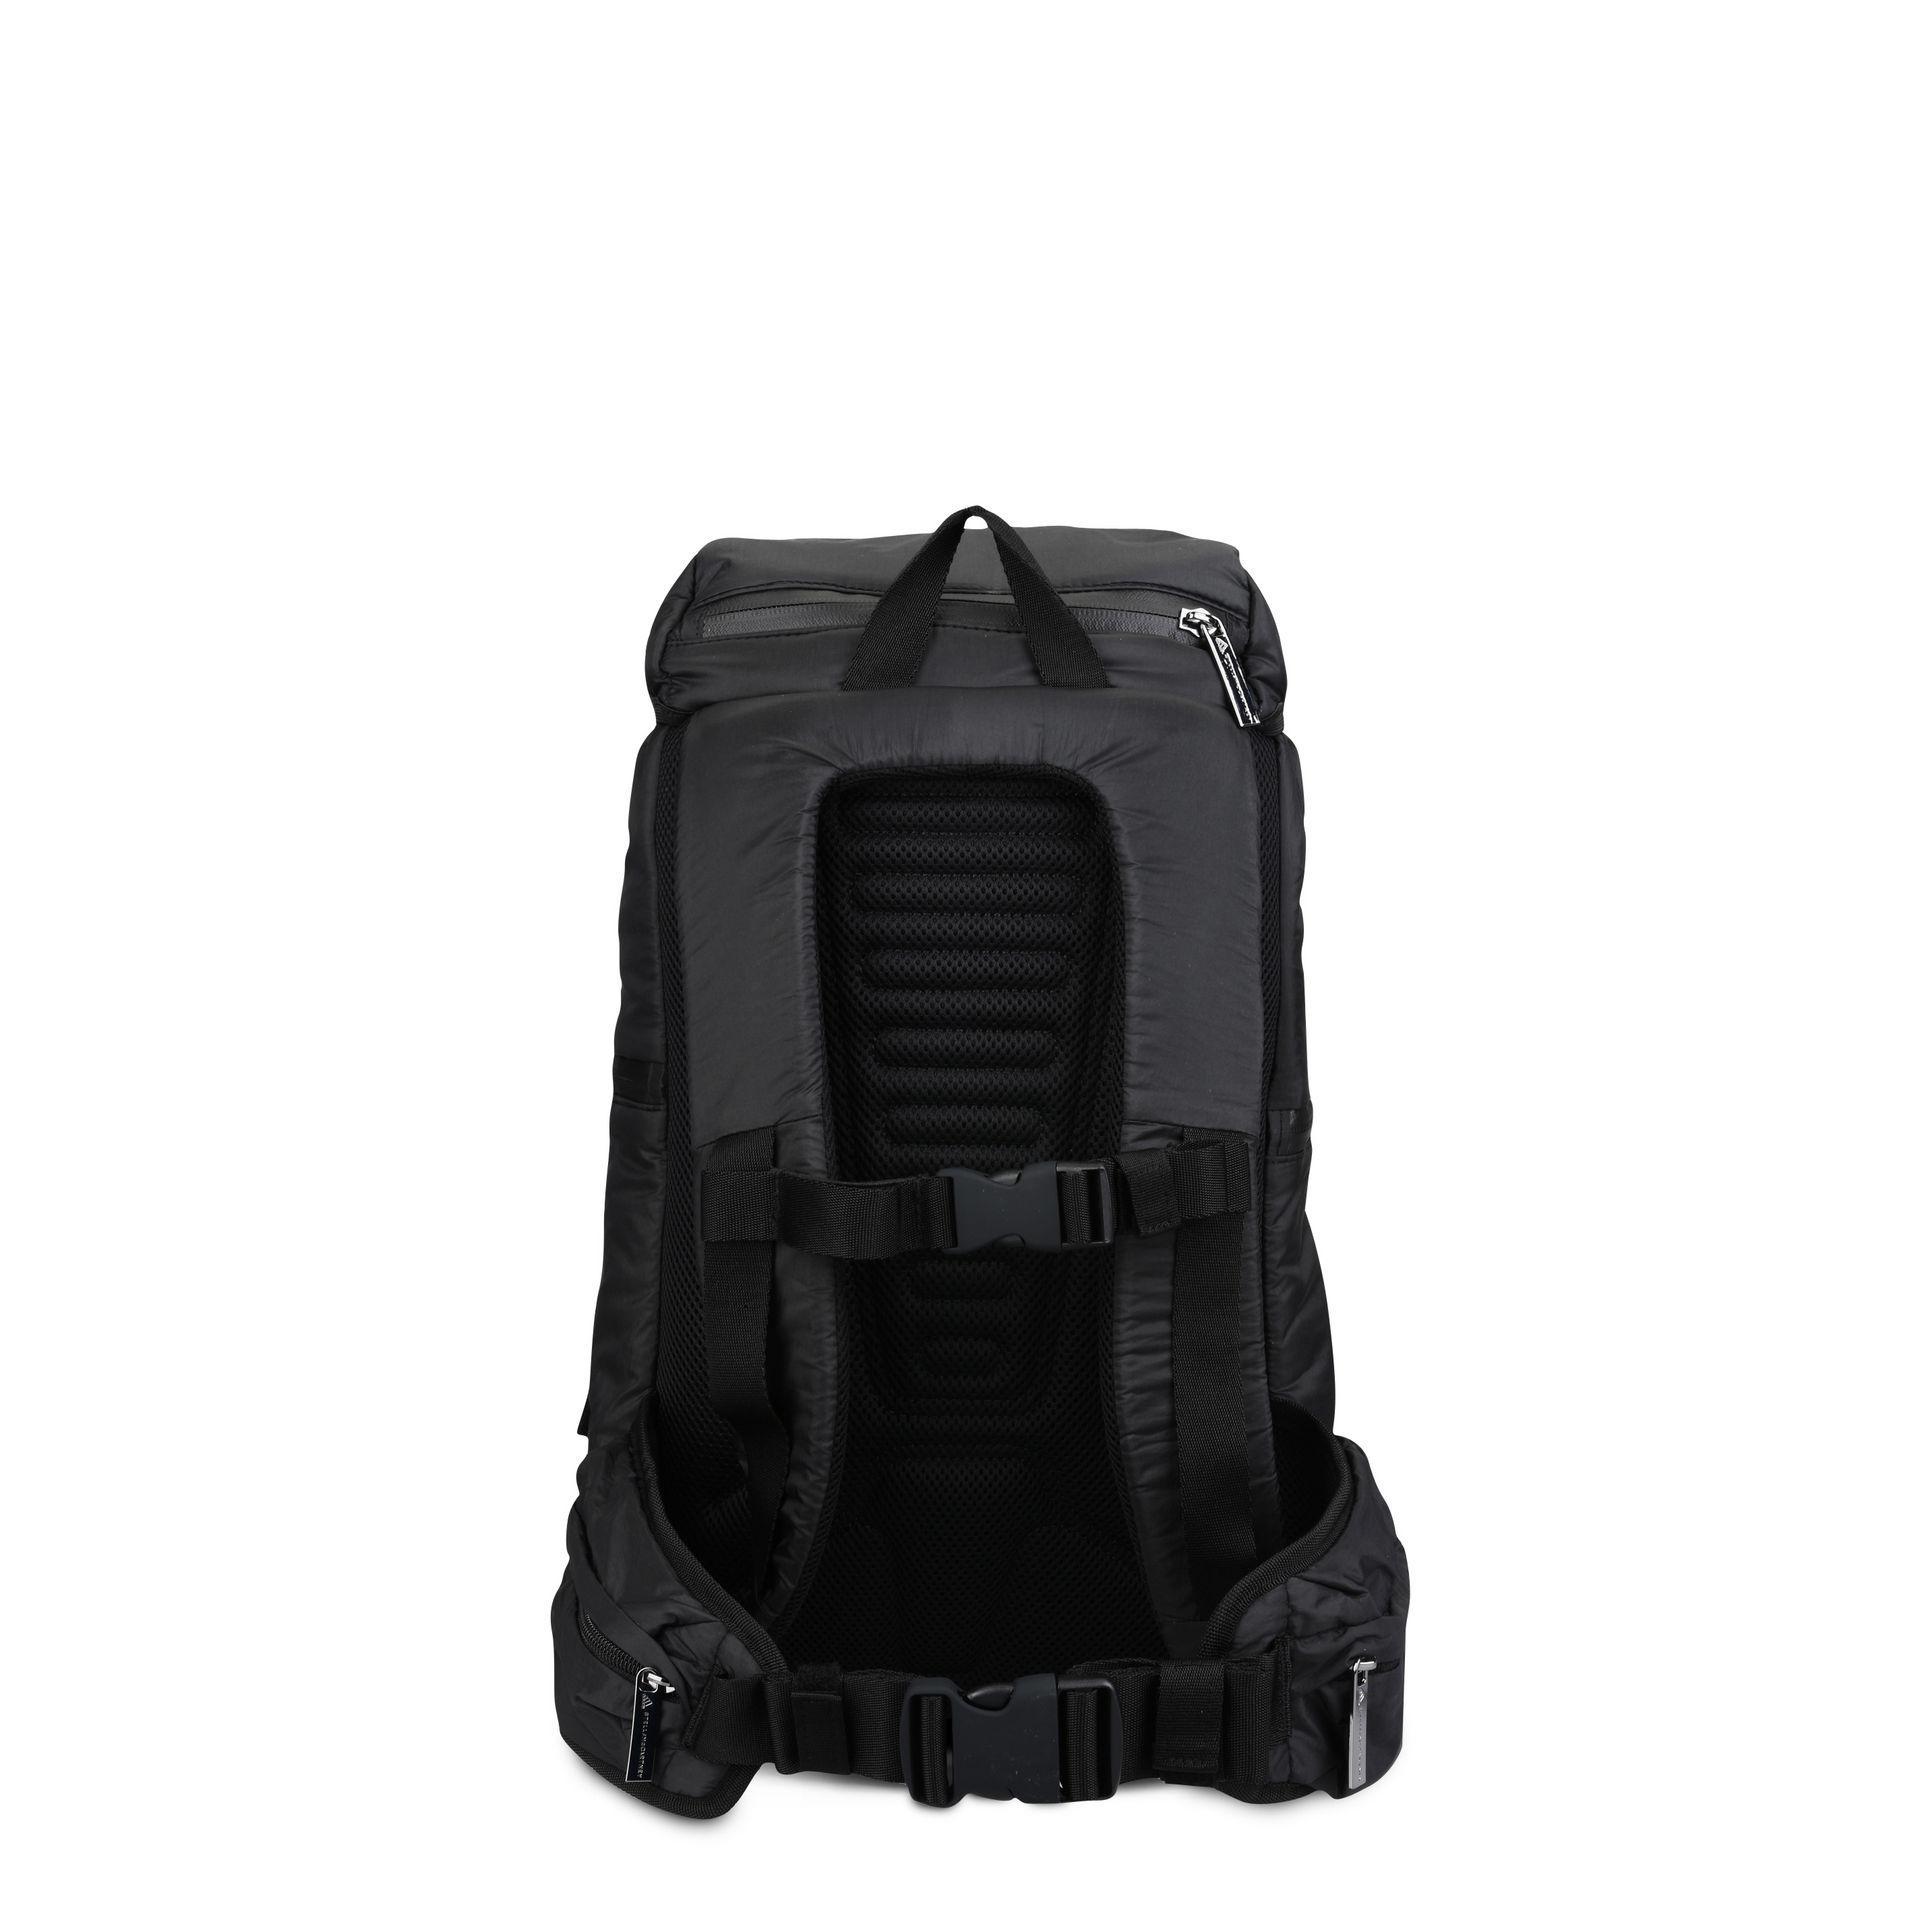 Adidas By Stella Mccartney Running Bags in Black